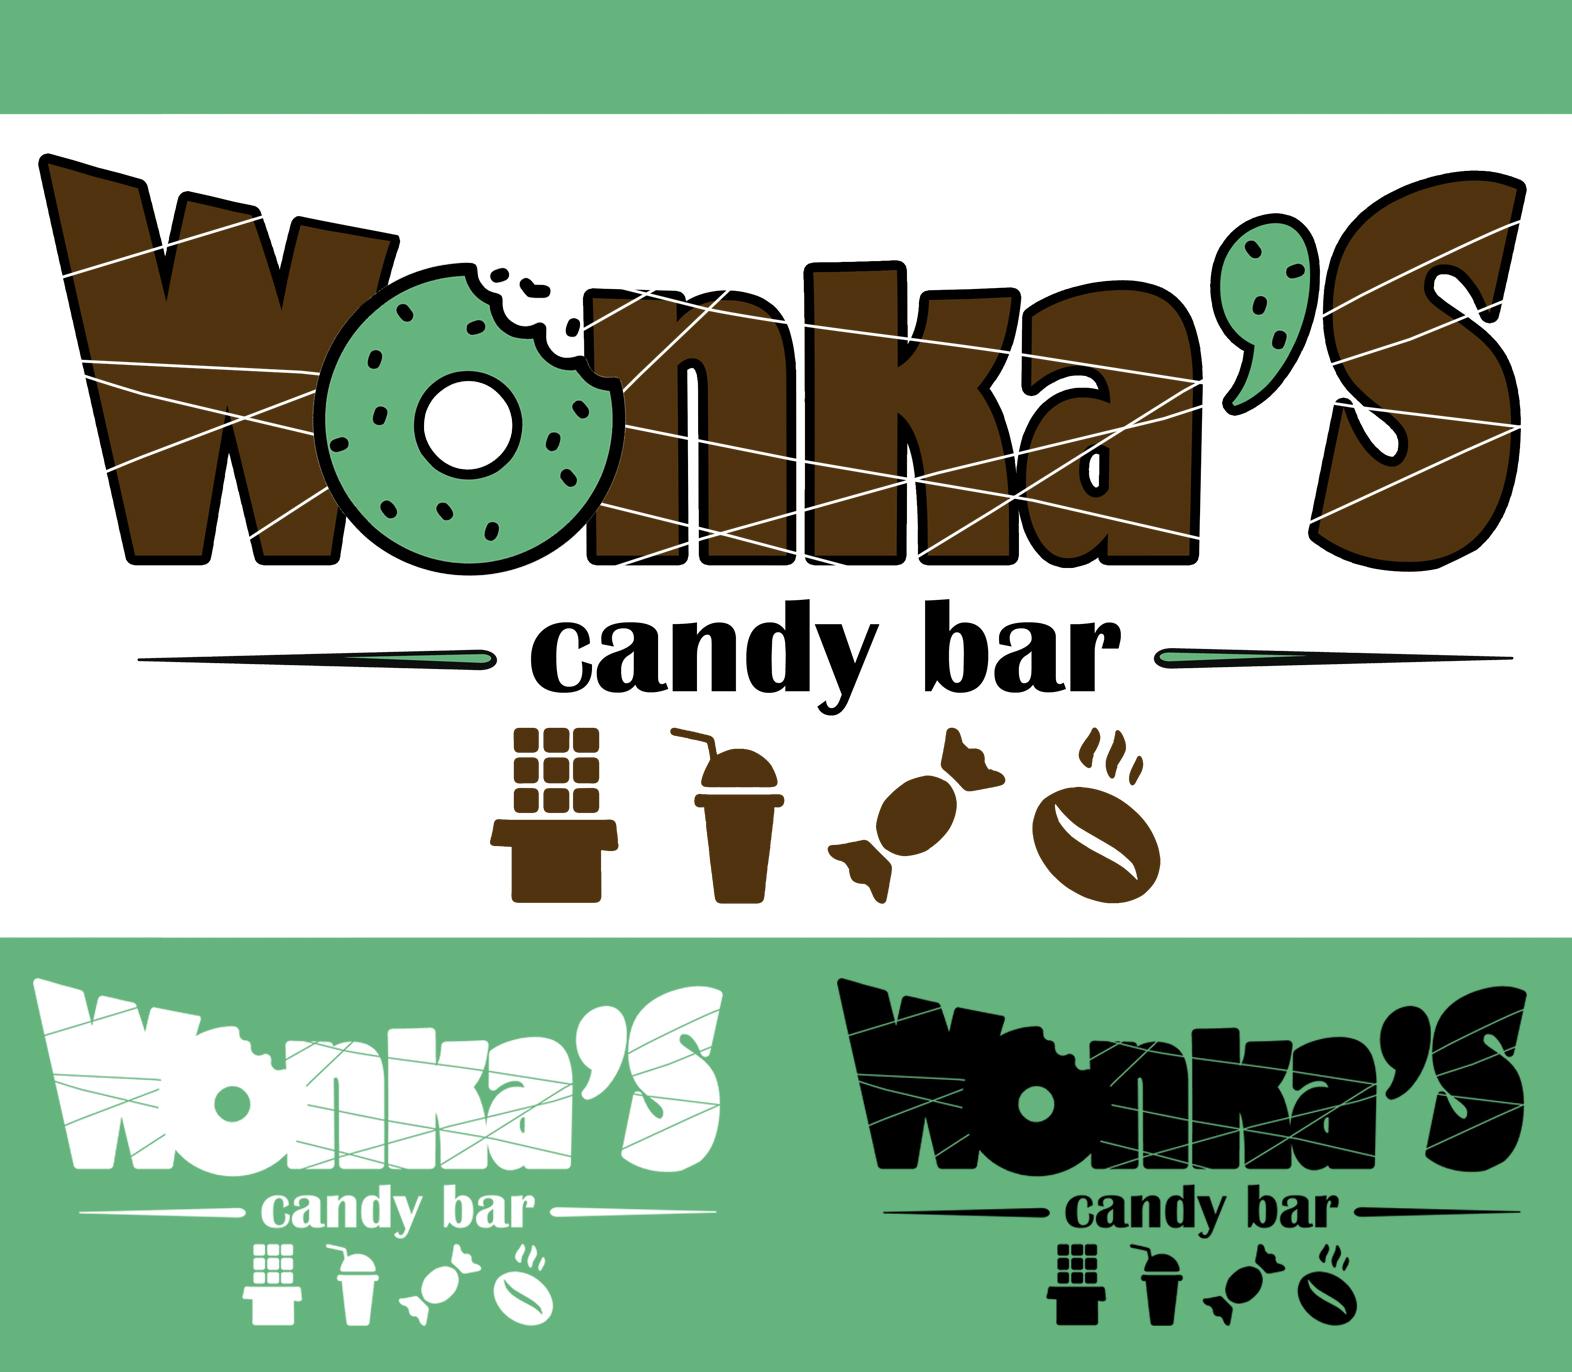 Разработка логотипа магазина сладостей со всего мира. фото f_2325a2ae2bd645c4.jpg